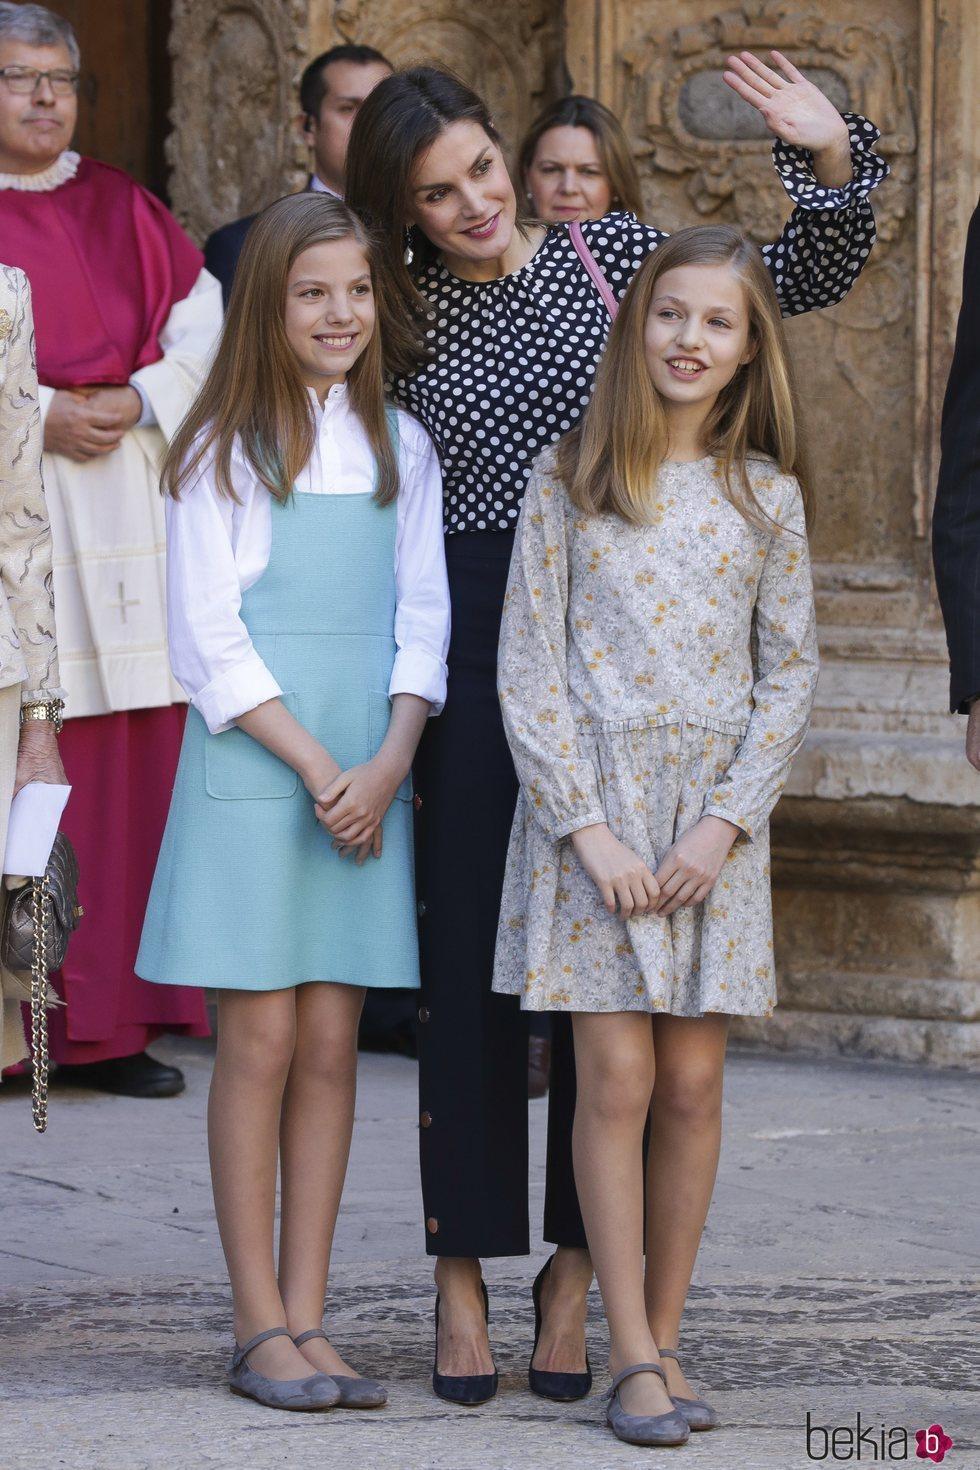 La Reina Letizia, la Princesa Leonor y la Infanta Sofía en la Misa de Pascua 2018